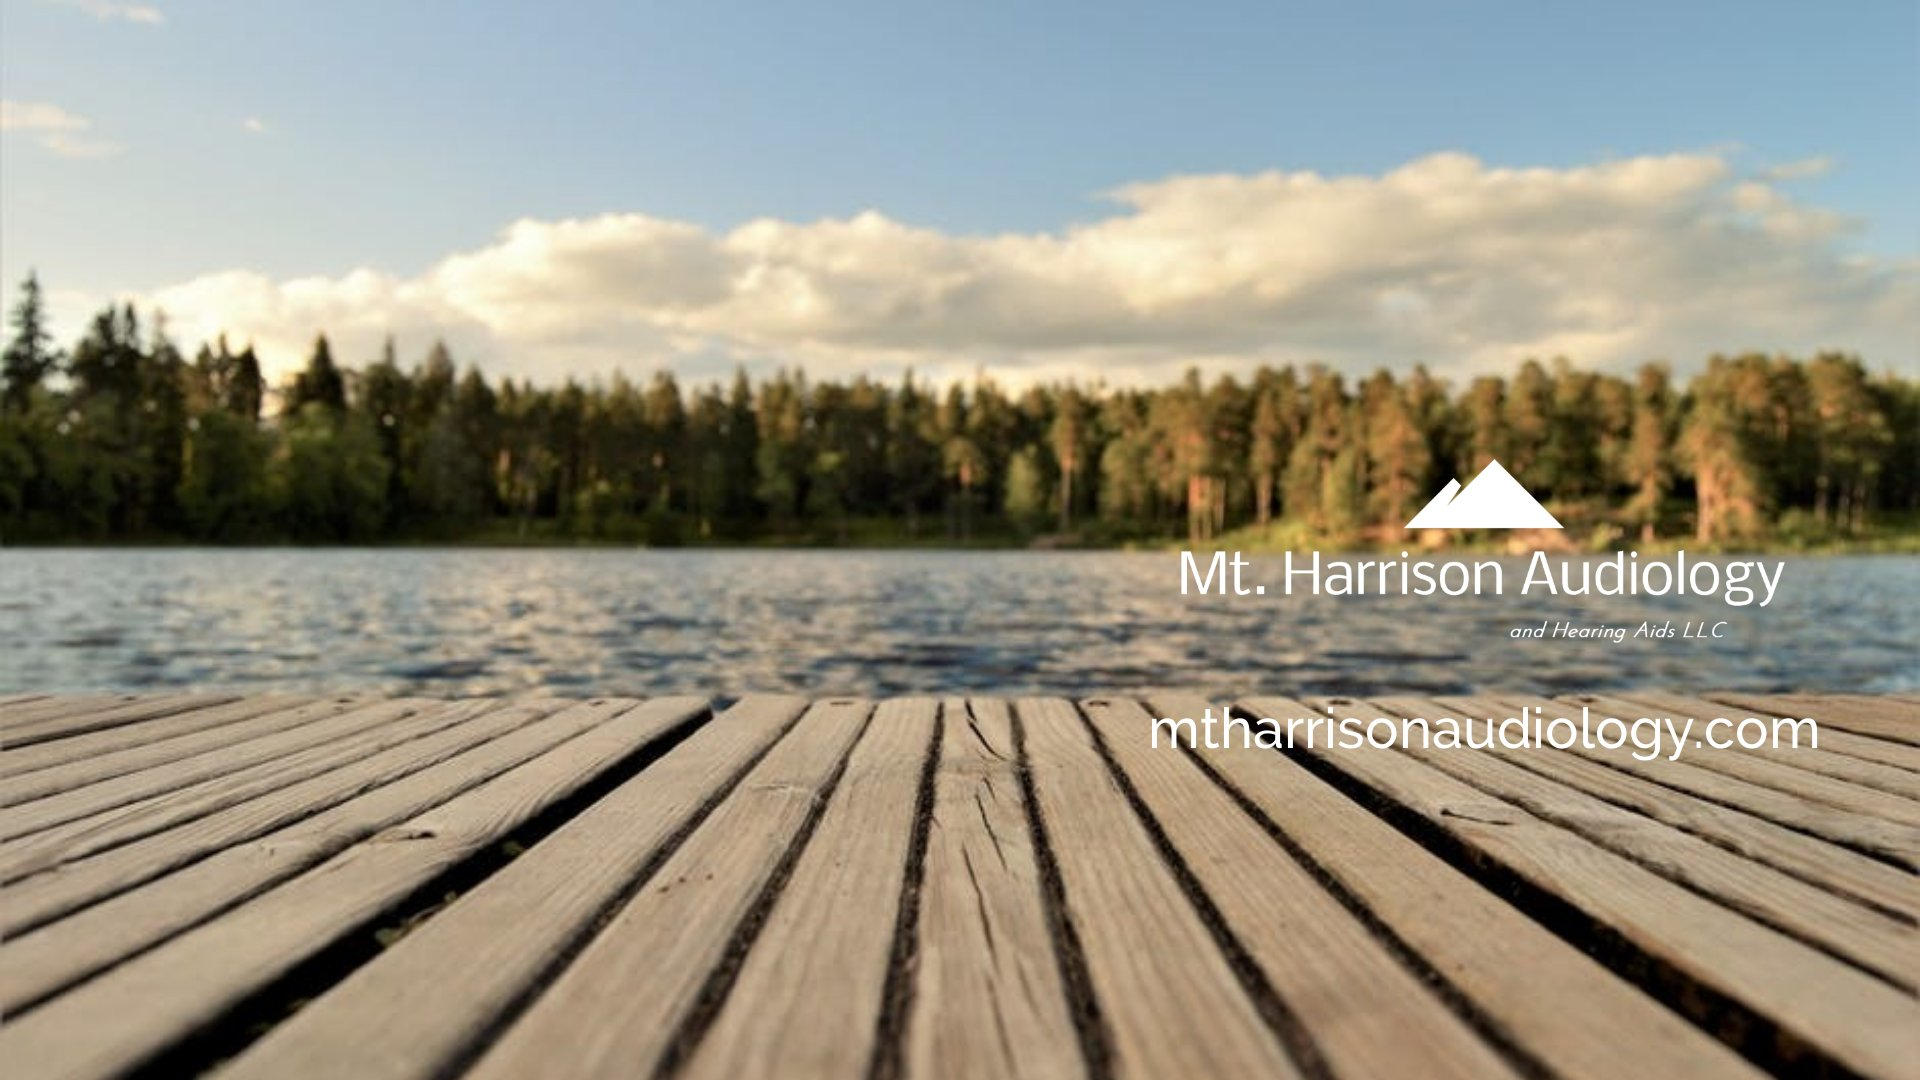 Mt. Harrison Audiology and Hearing Aids, LLC